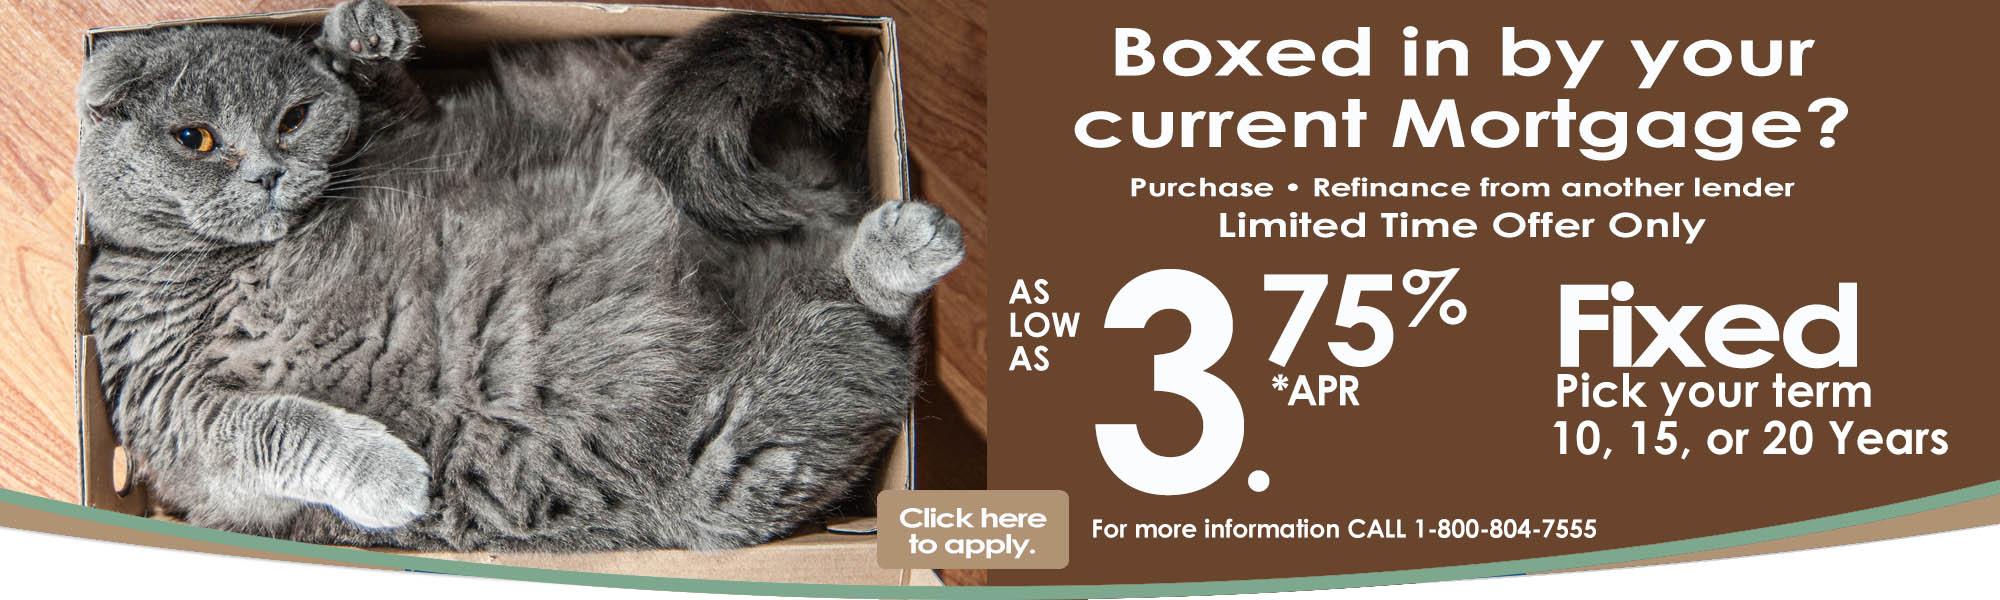 mortgage cat in box